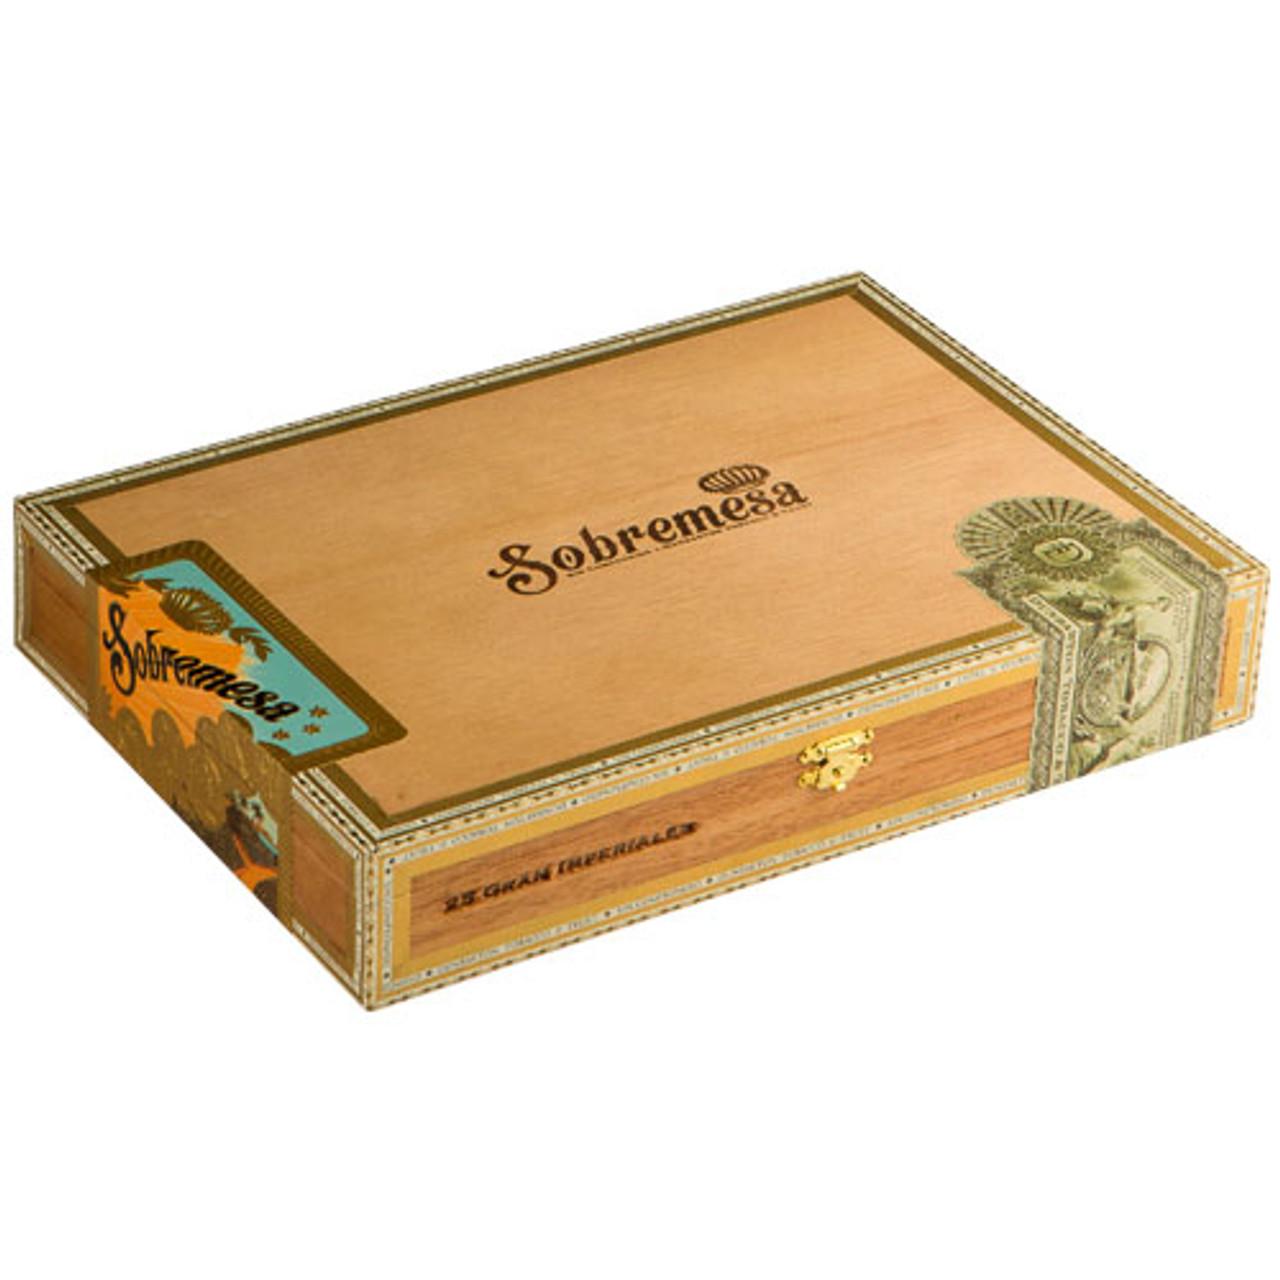 Sobremesa Torpedo Tiempo Cigars - 6 x 54 (Box of 25)